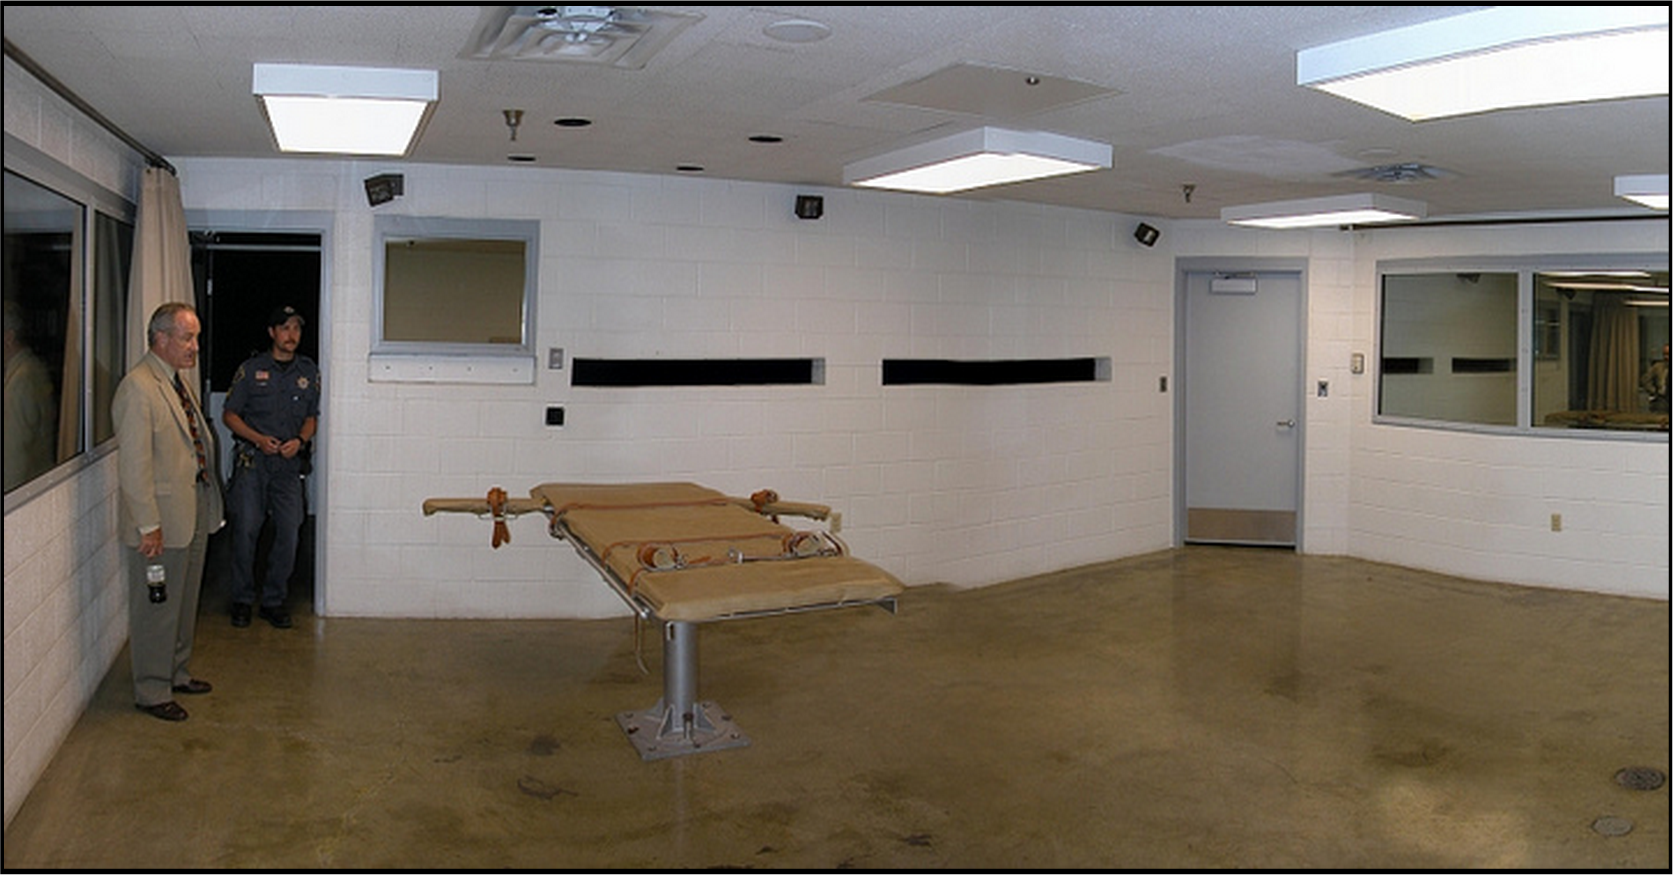 Capital punishment vs life in prison essay